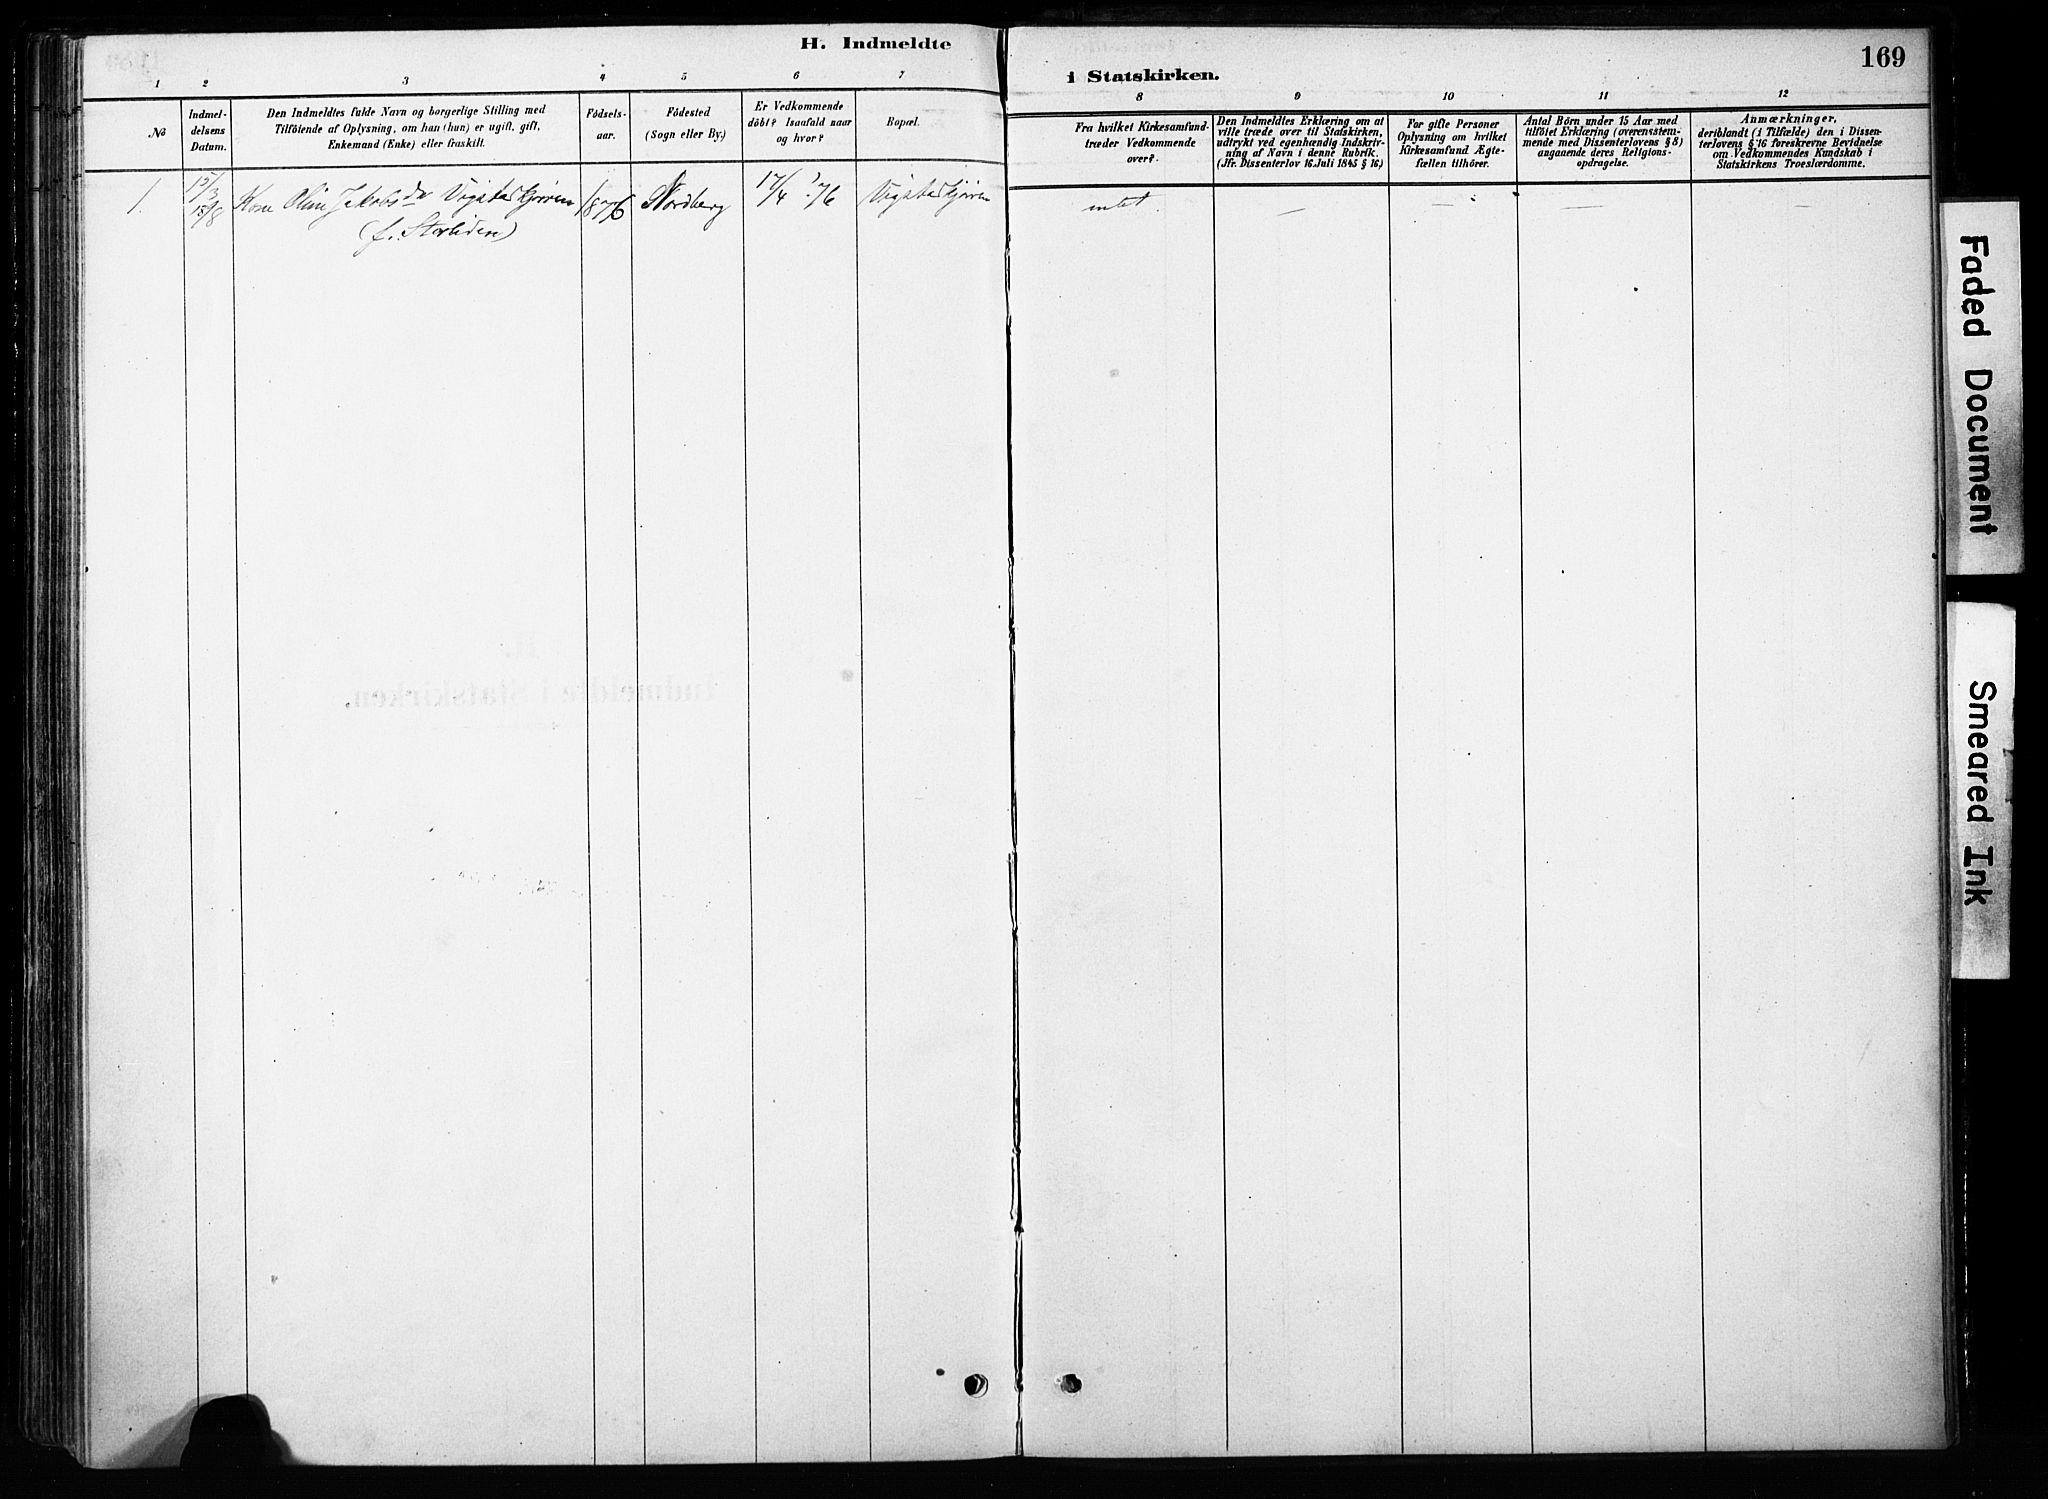 SAH, Skjåk prestekontor, Ministerialbok nr. 4, 1880-1904, s. 169